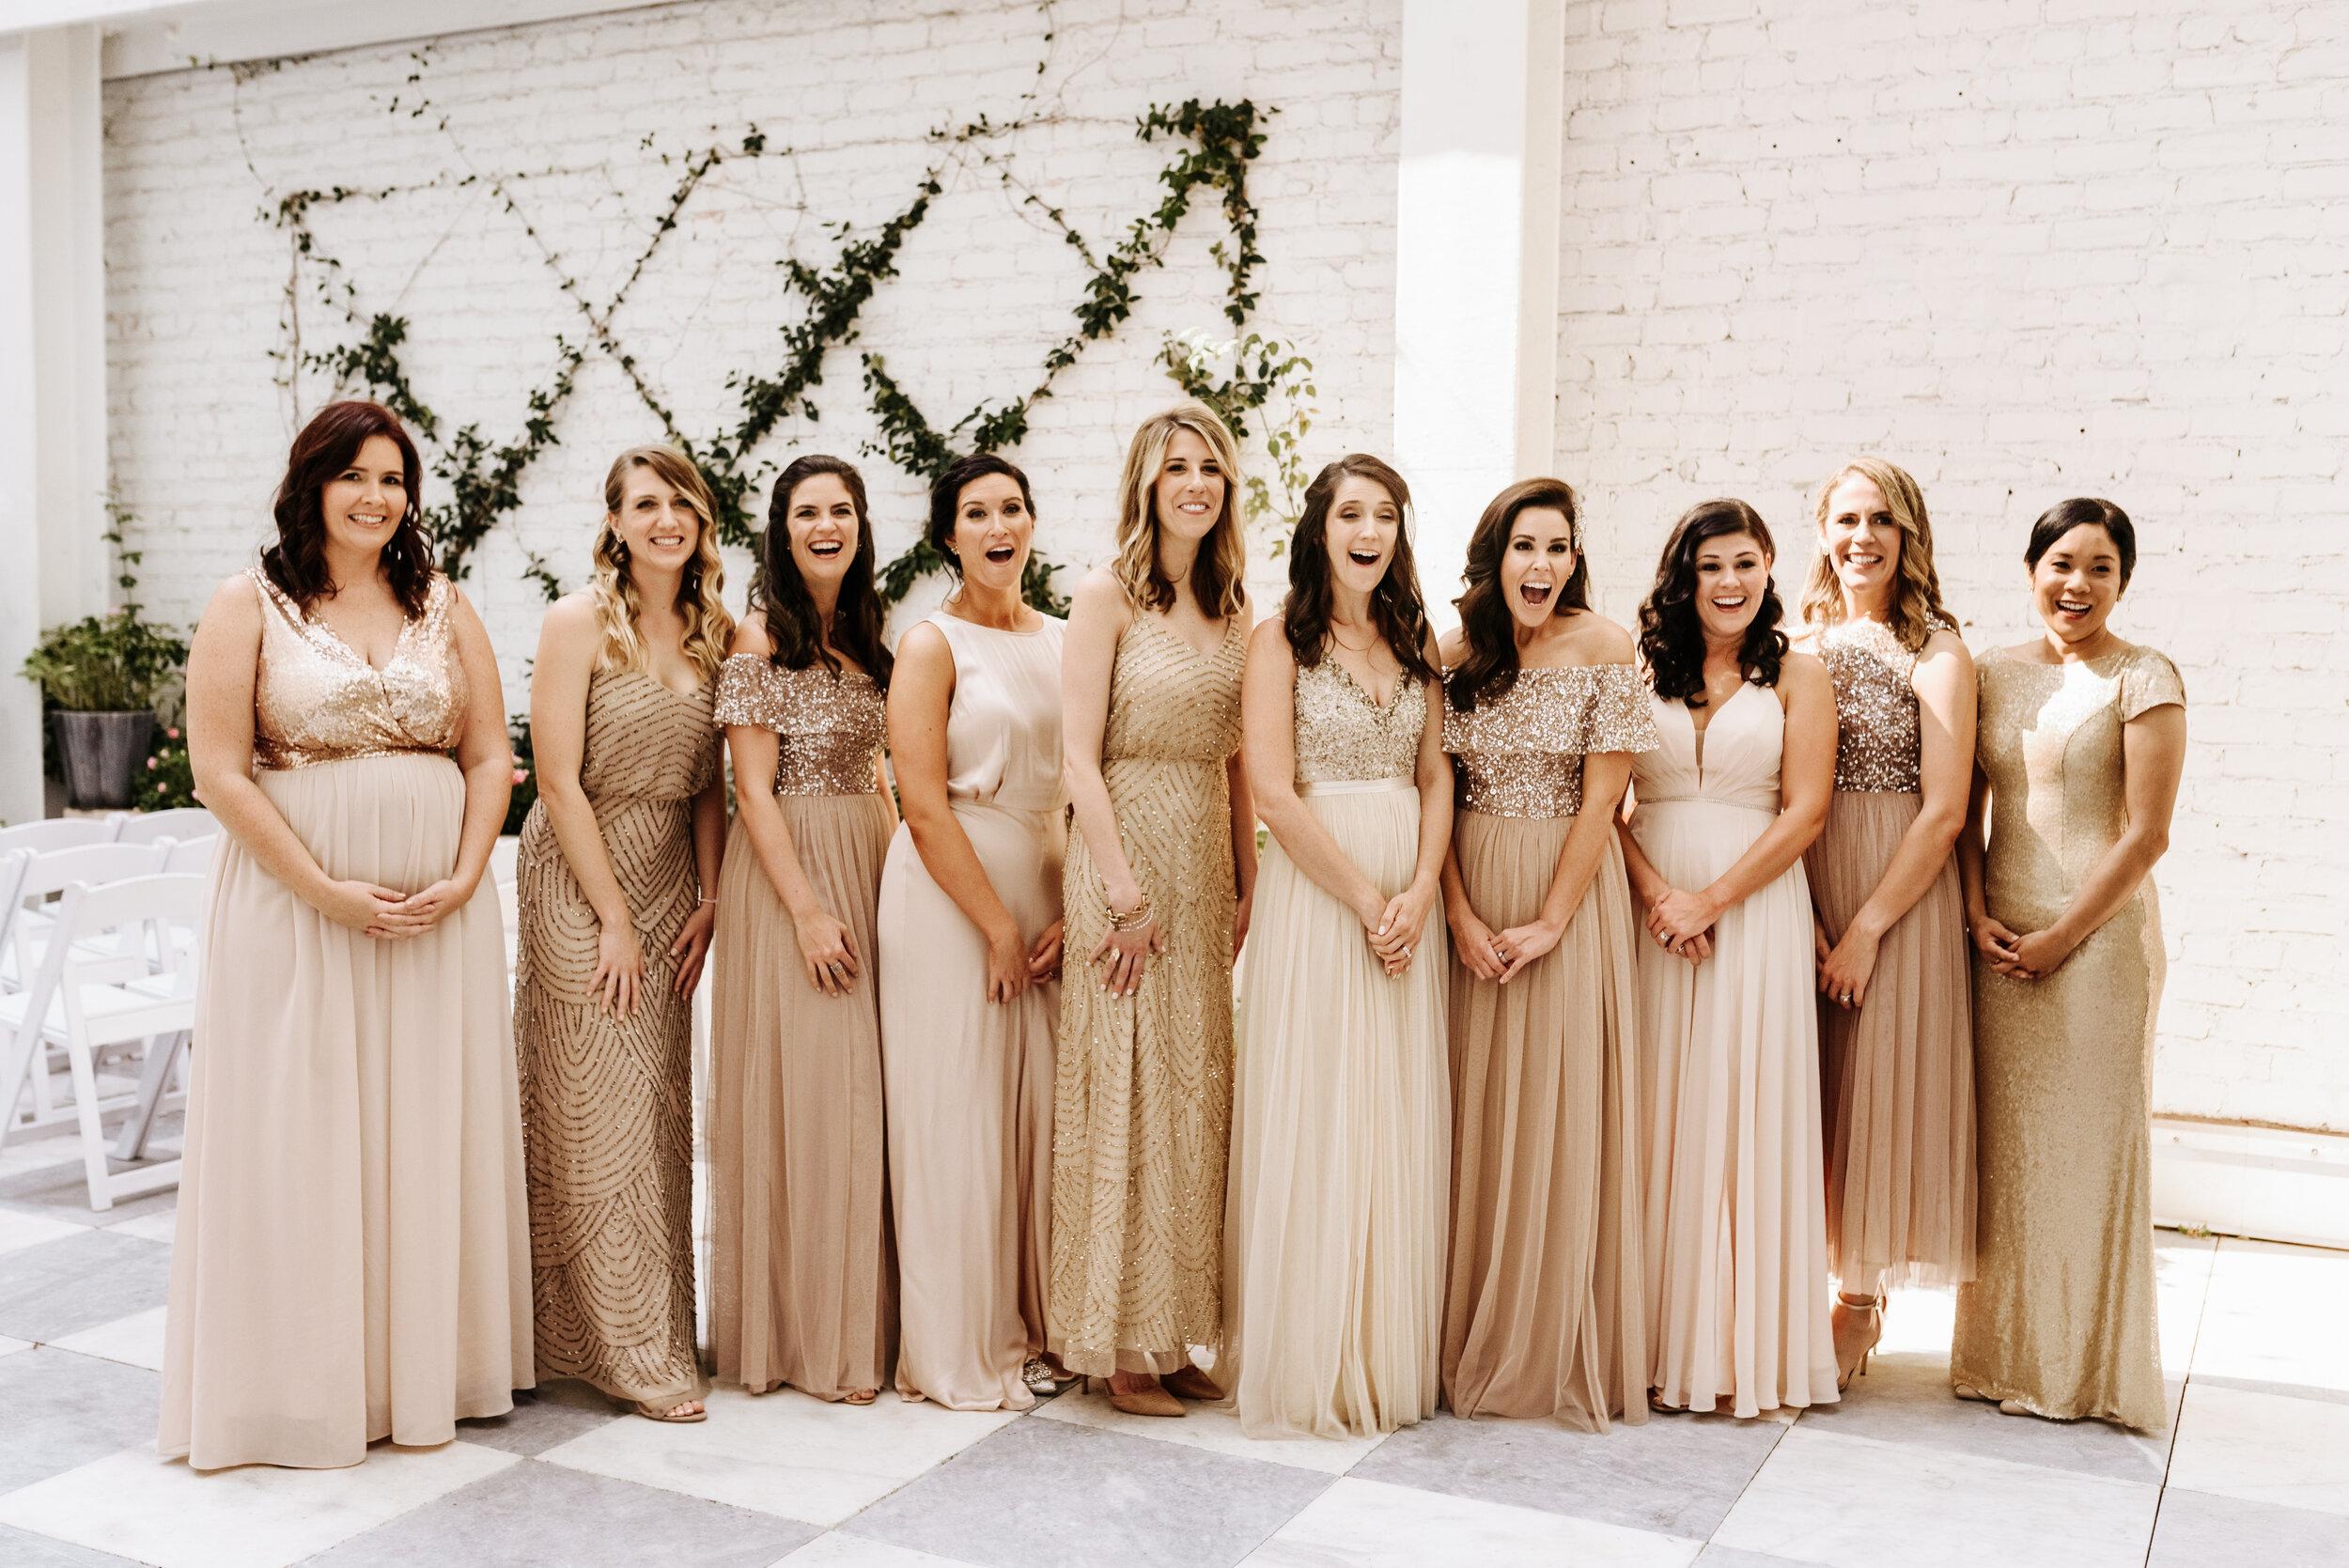 Cassie-Mrunal-Wedding-Quirk-Hotel-John-Marshall-Ballrooms-Richmond-Virginia-Photography-by-V-14.jpg